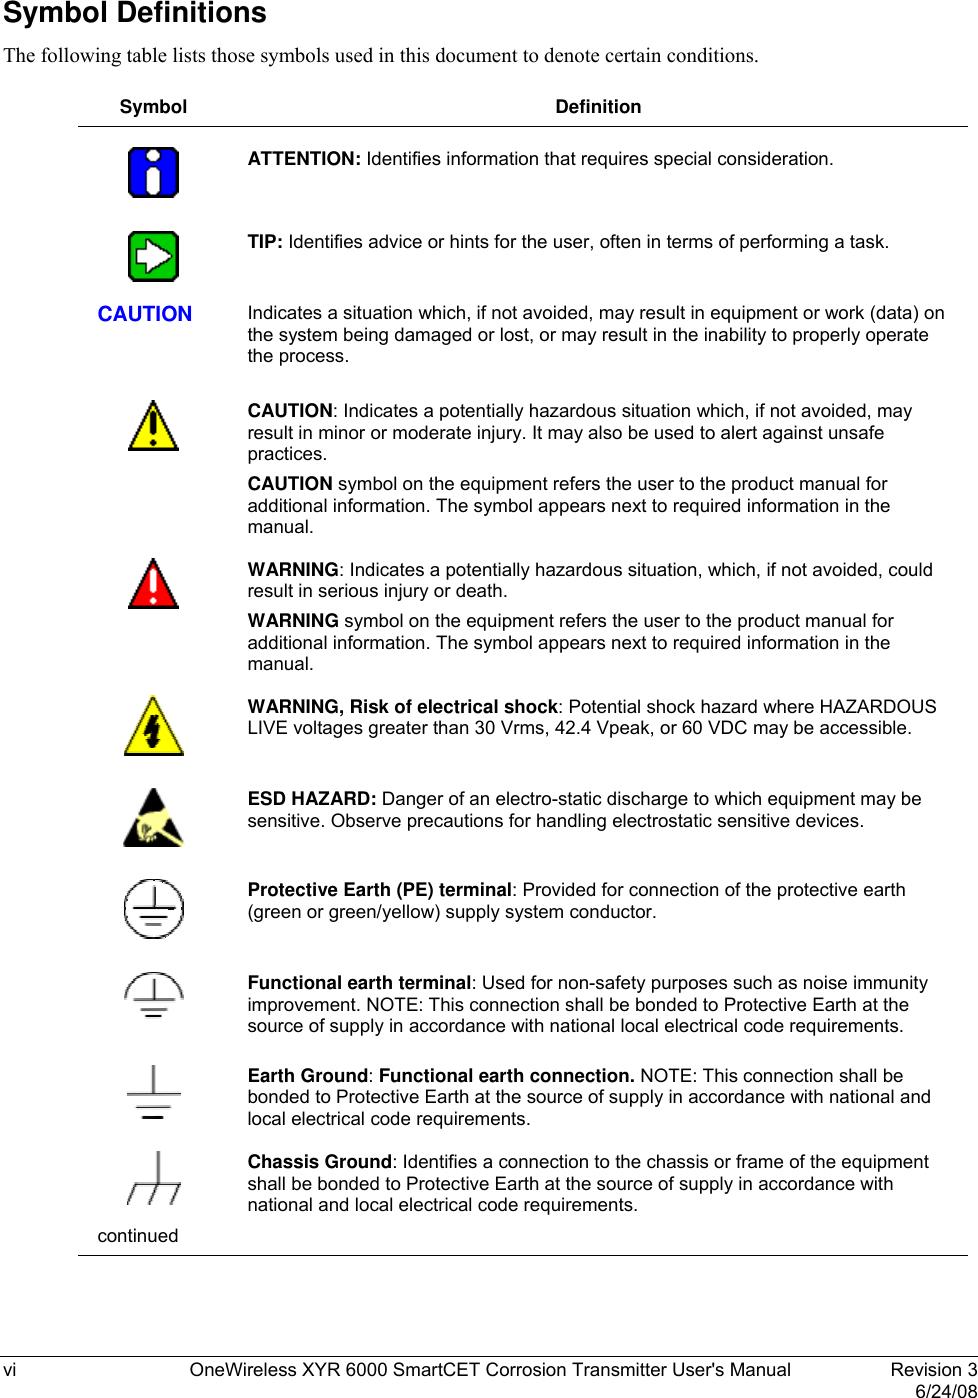 Fantastic Ground Symbol Electrical Illustration - Electrical Diagram ...